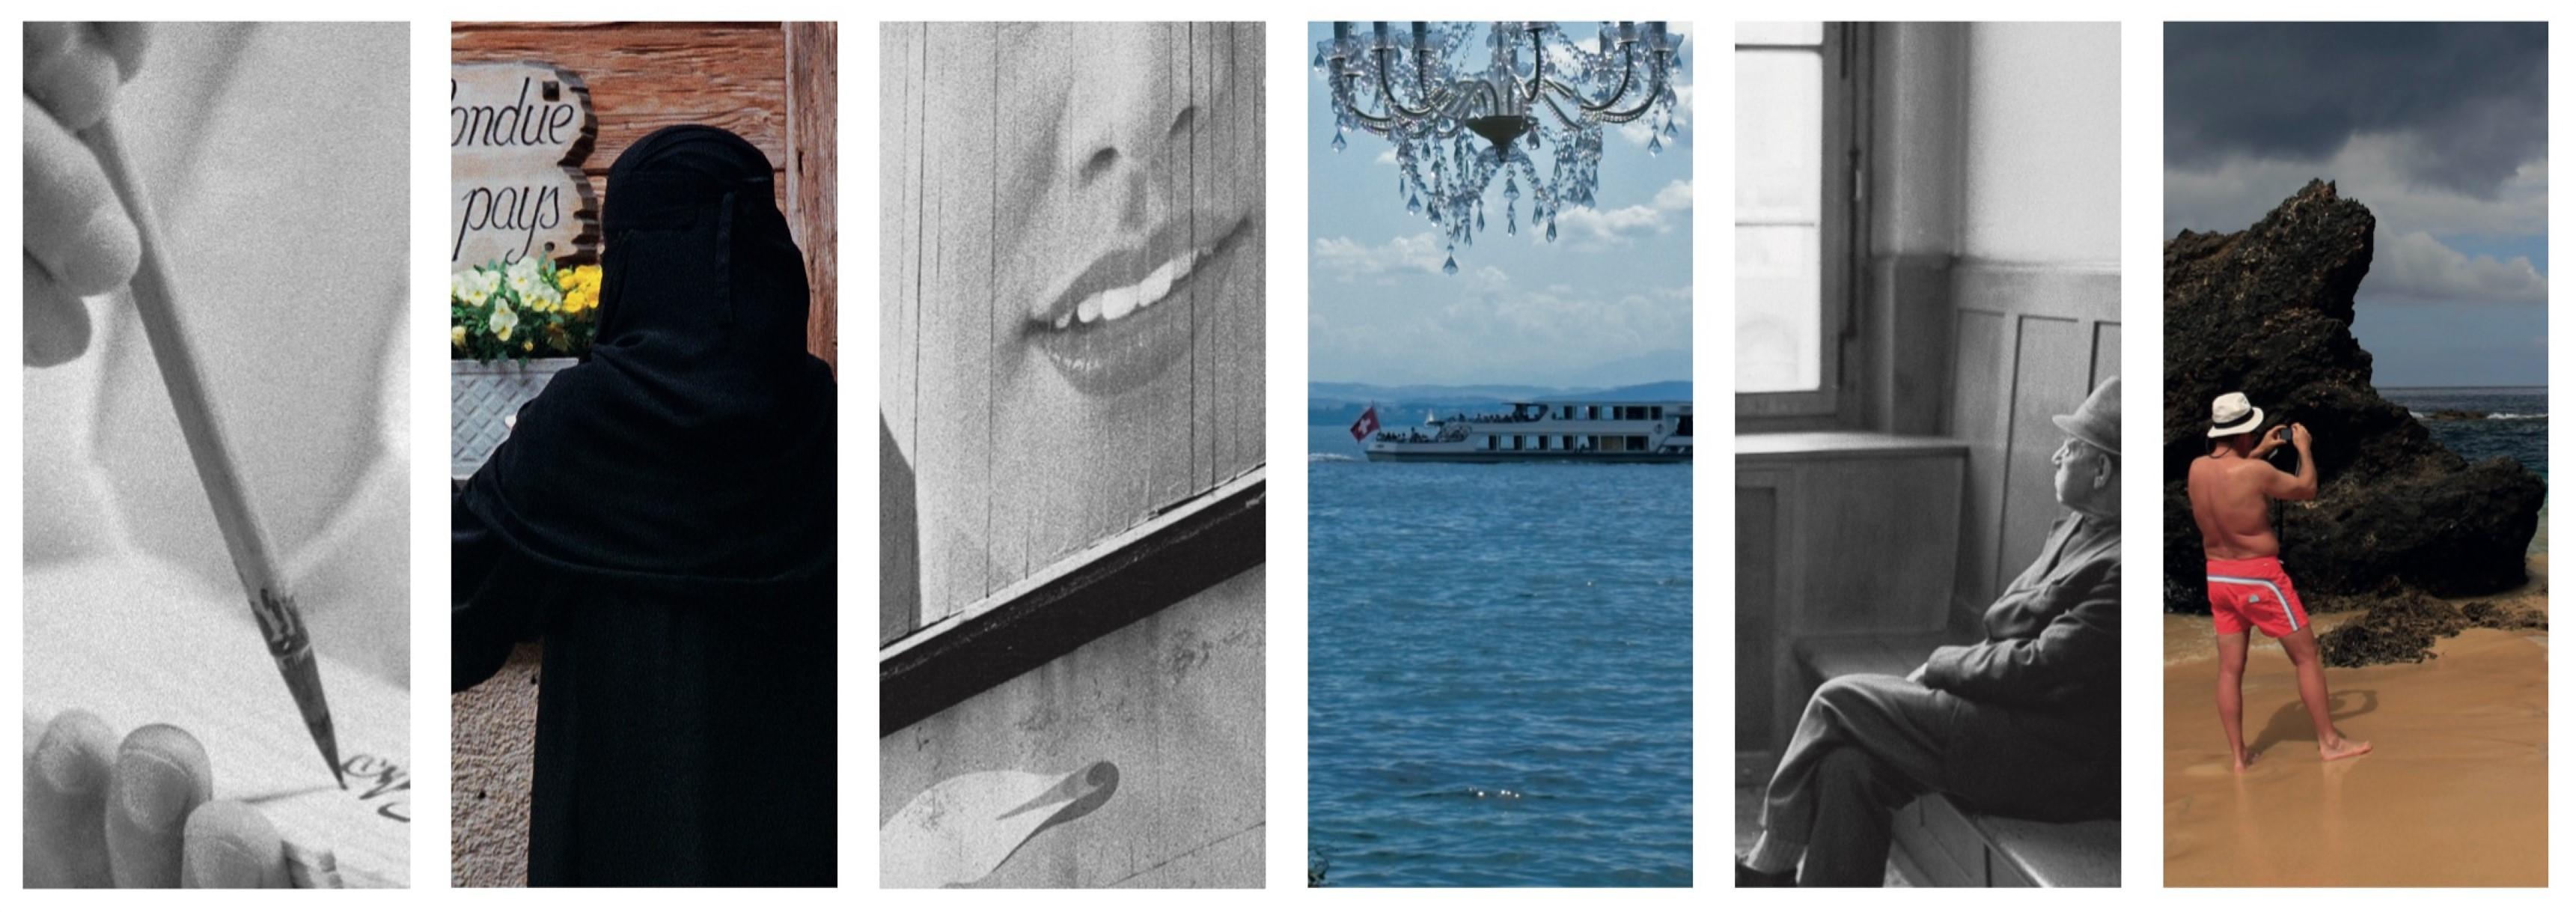 http://www.romanoriedo.ch/files/gimgs/1_flyer-murten-fotos.jpg